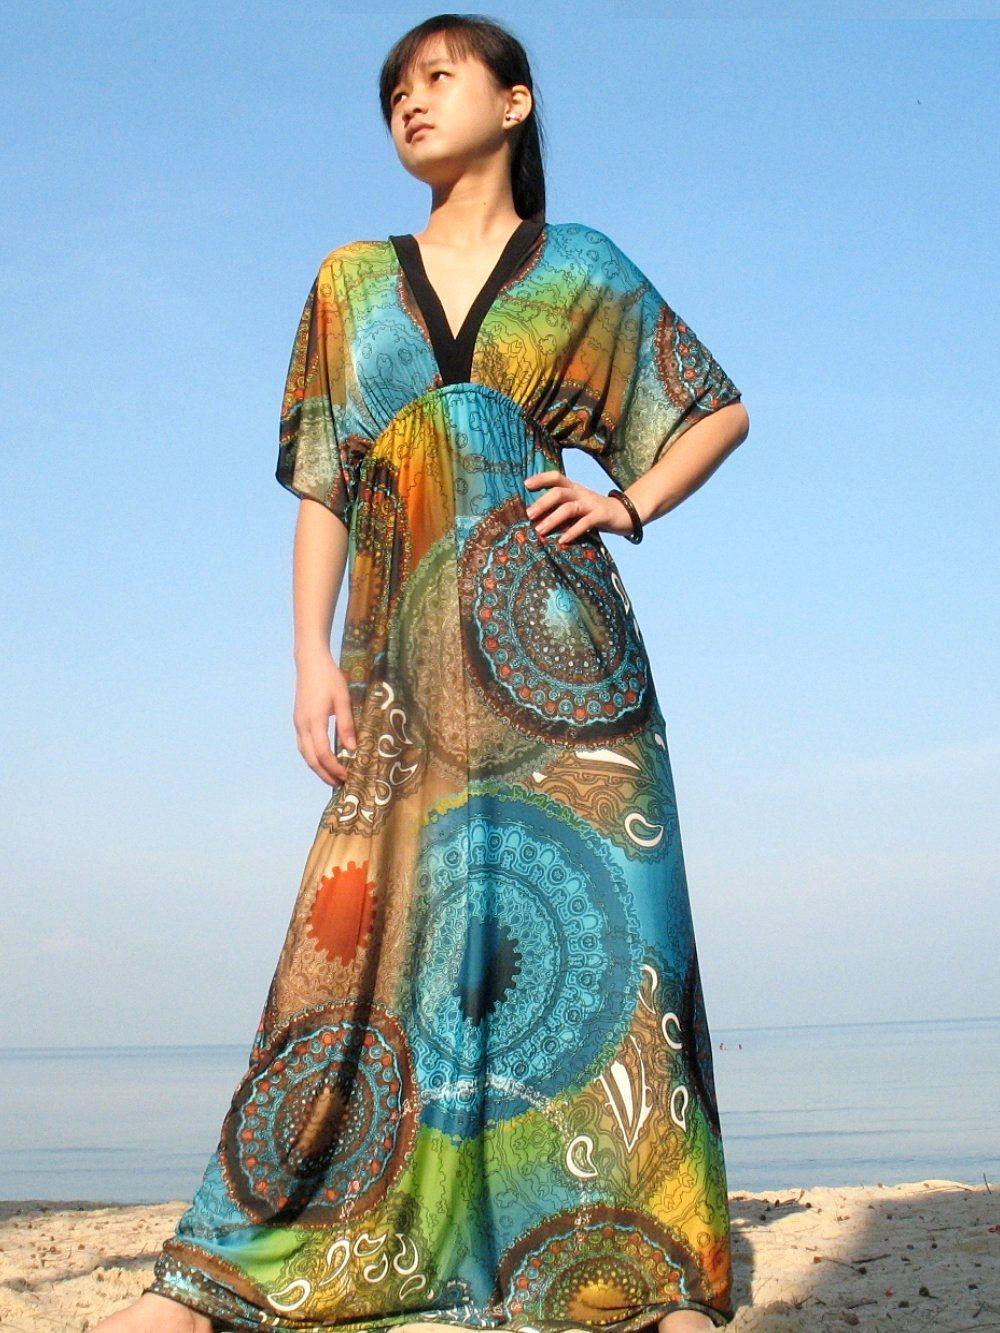 Women Plus Sizes Clothing Moon Collection Long Maxi Dress Plus Size Dress 1x 2x 3x 4x 5x 55 00 Via Etsy Ropa Ropa Linda Moda [ 1333 x 1000 Pixel ]